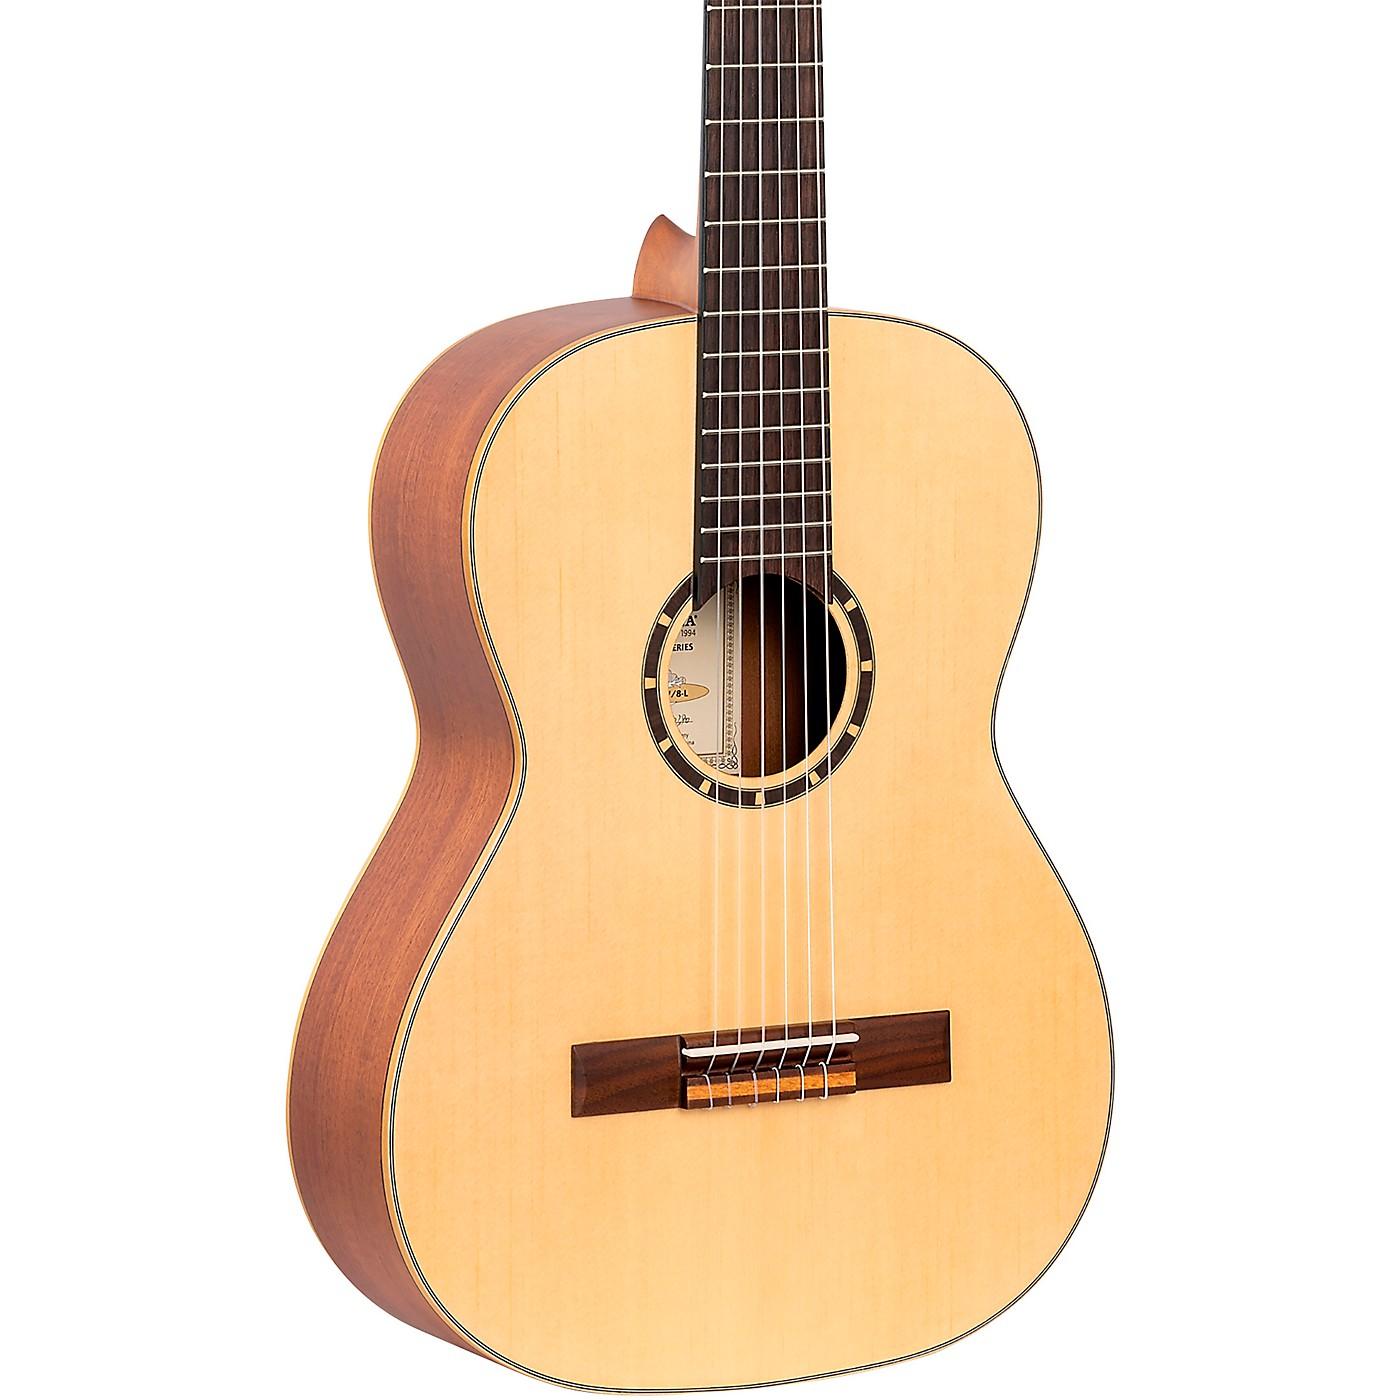 Ortega Family Series R121-7/8-L 7/8 Size Classical Guitar thumbnail